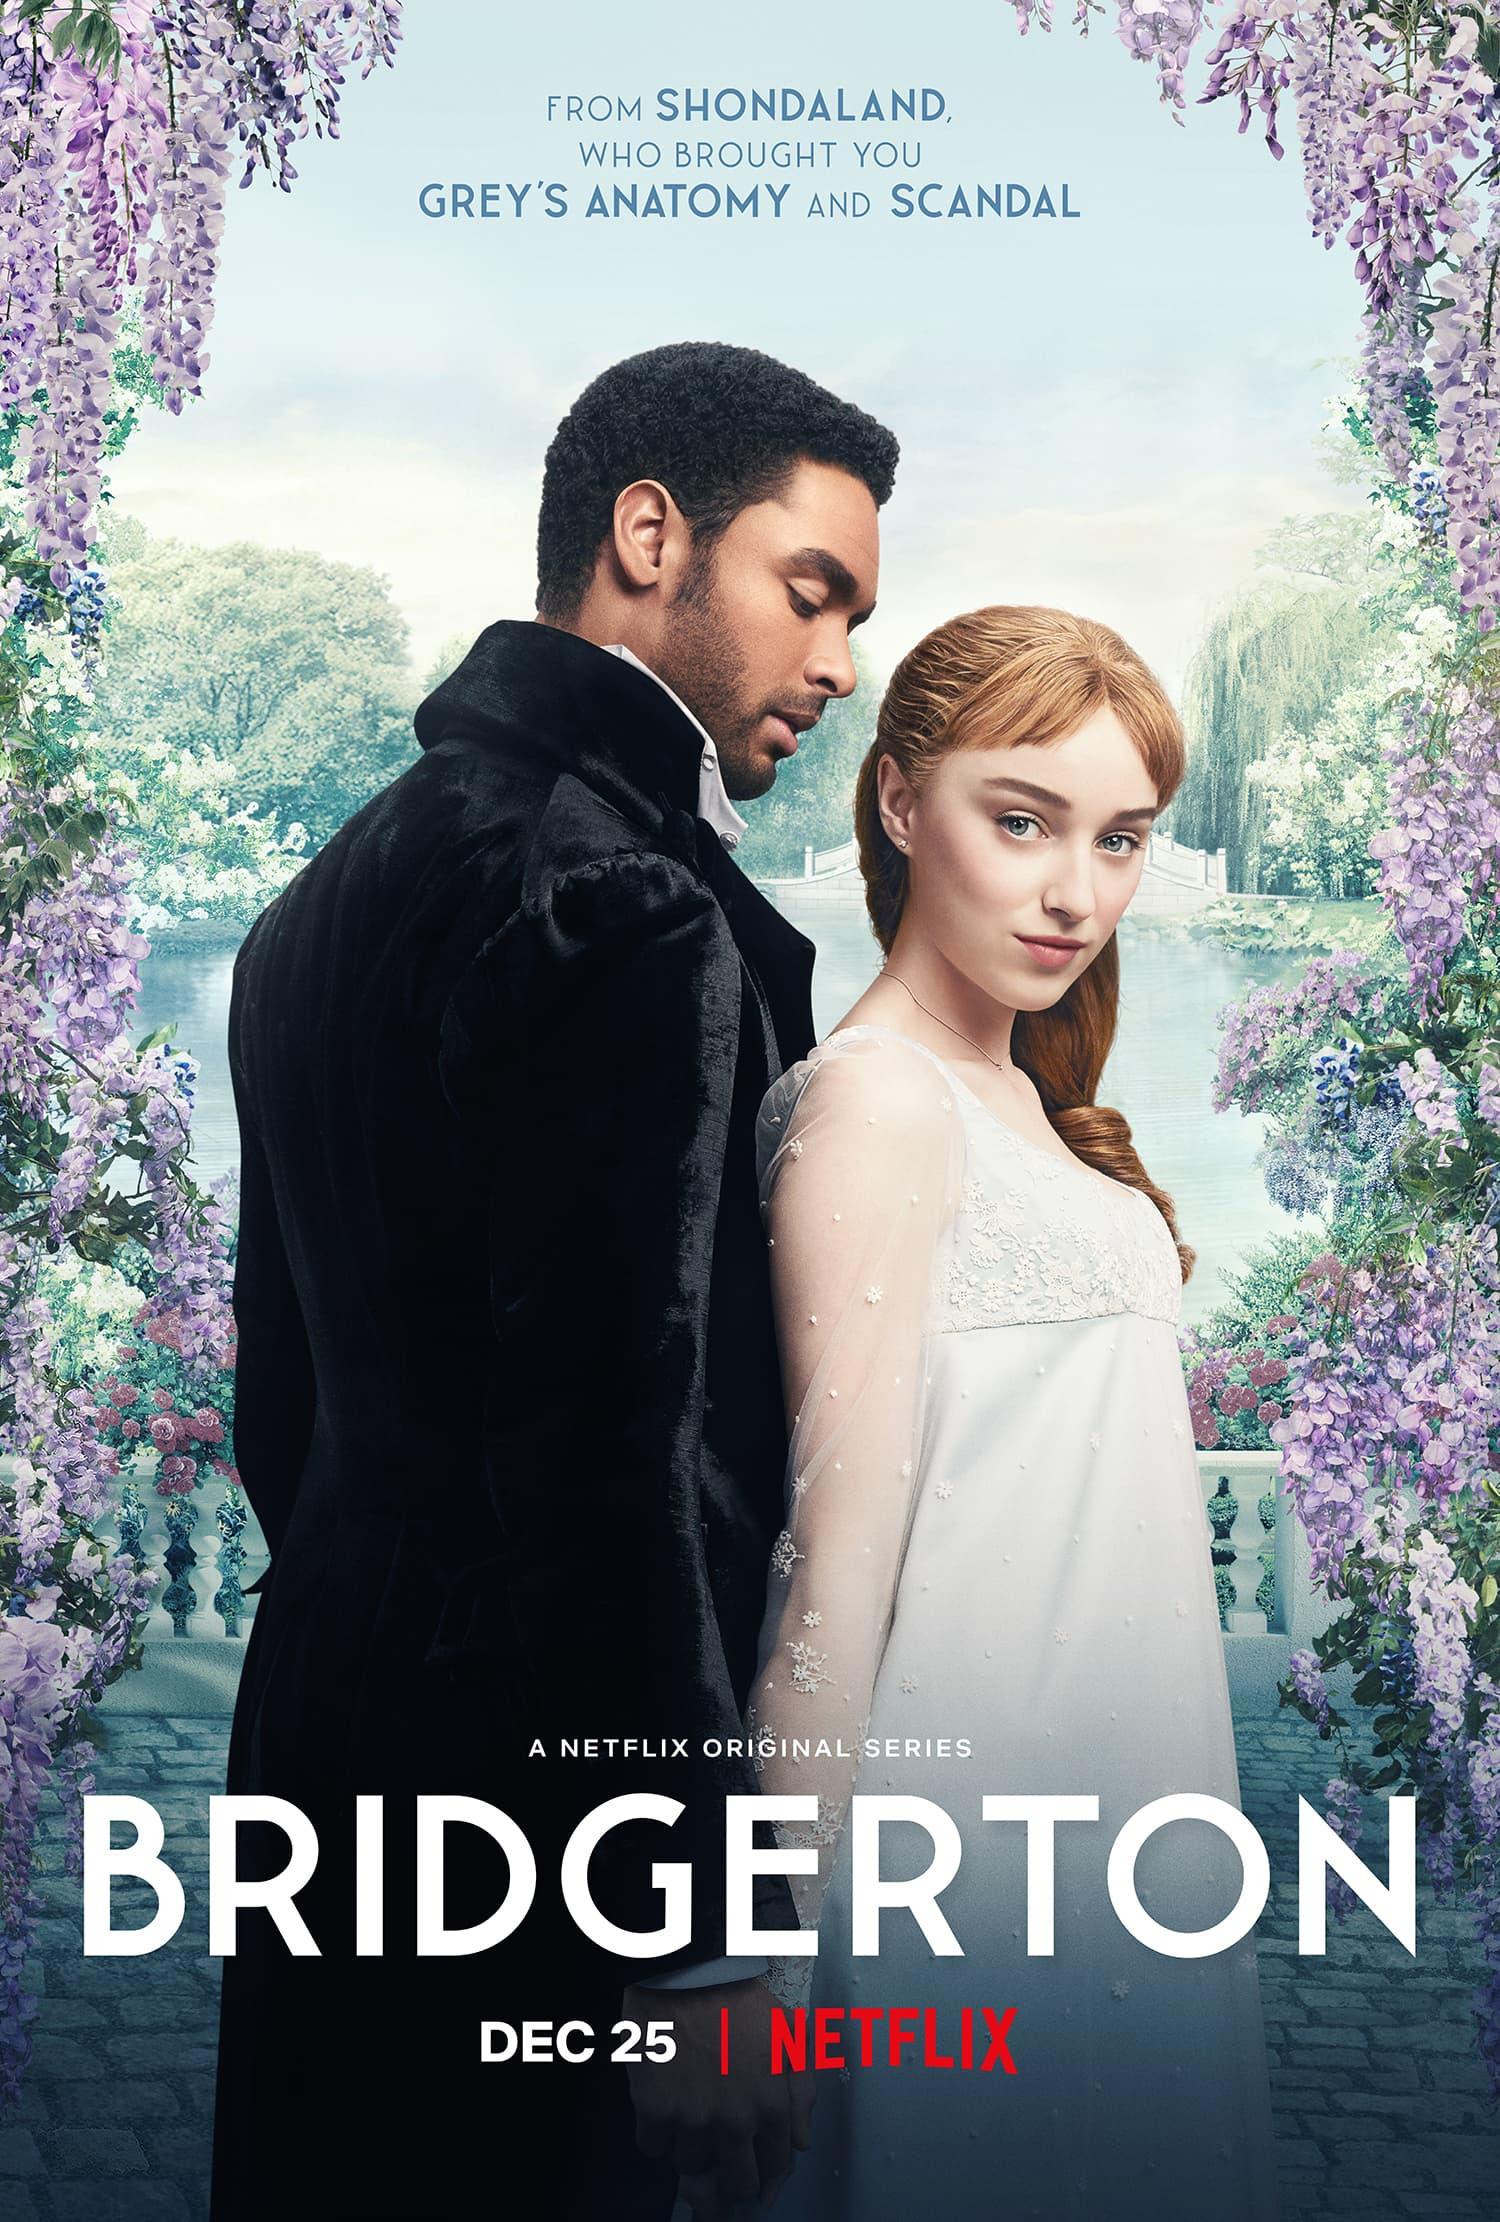 Bridgerton: Hottest Show on Netflix Right Now?